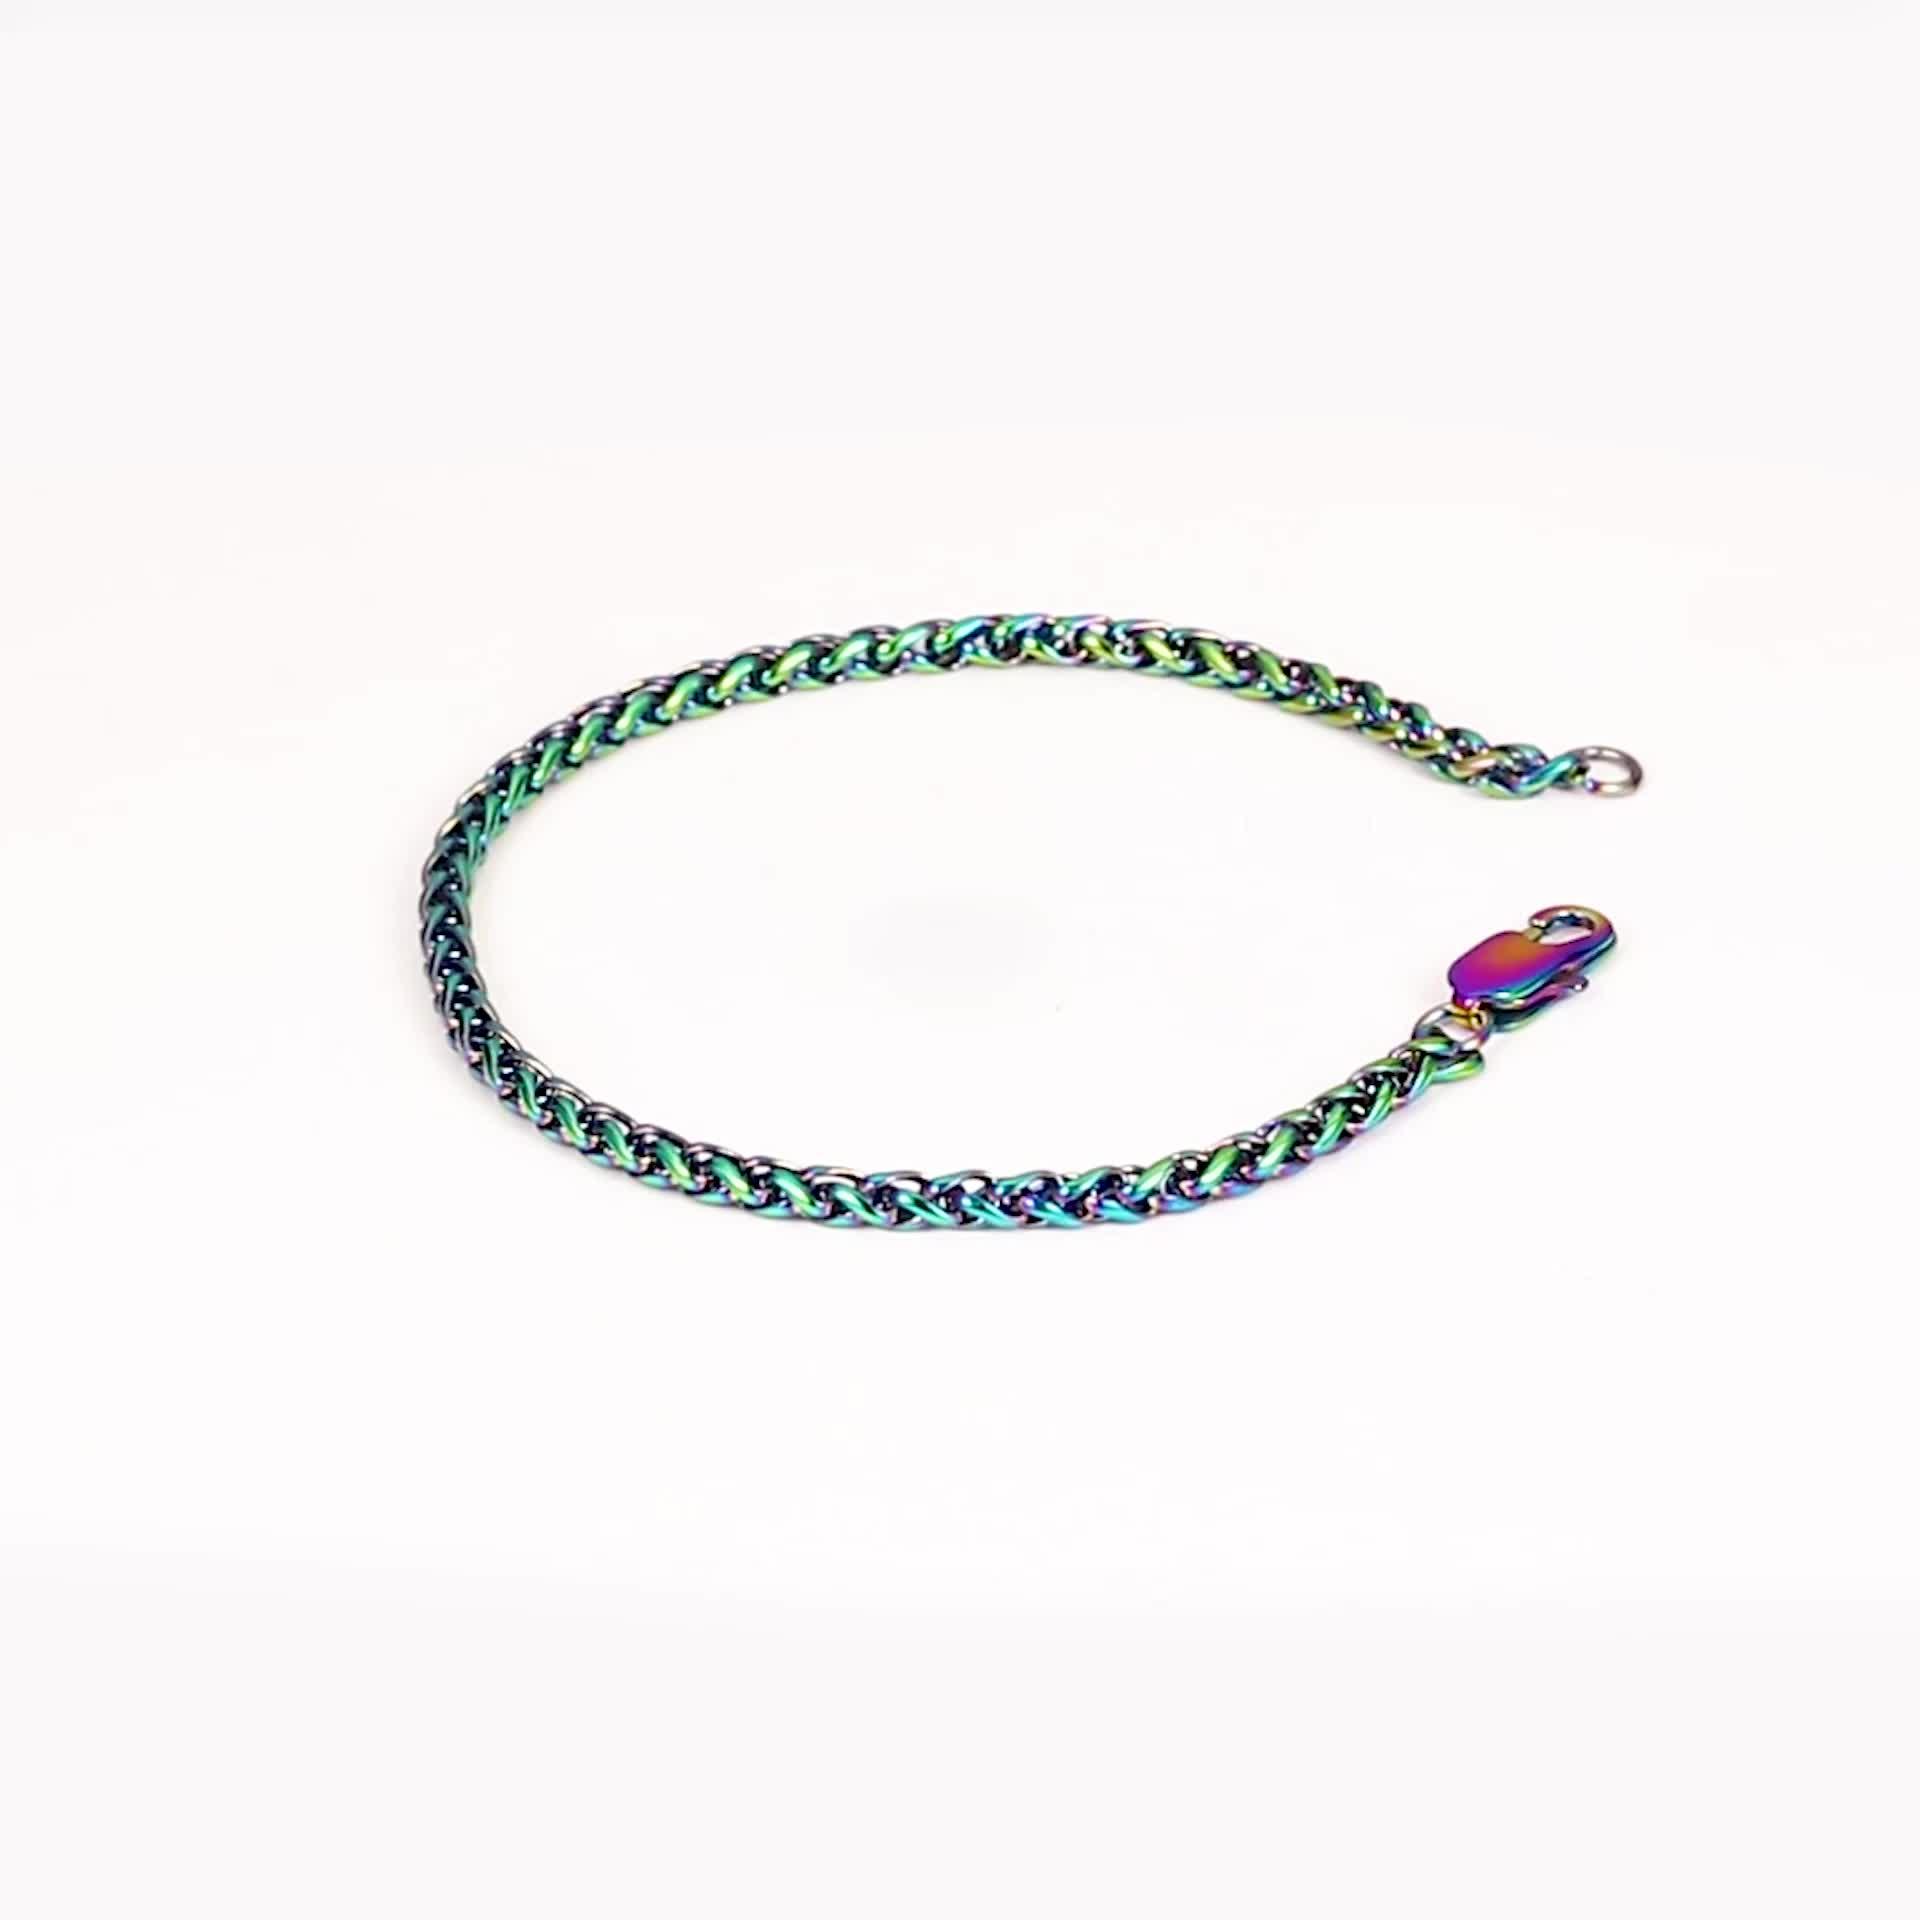 High Polish Lock Schnalle 316L Edelstahl Regenbogen Cuban Link Kette armband für Männer